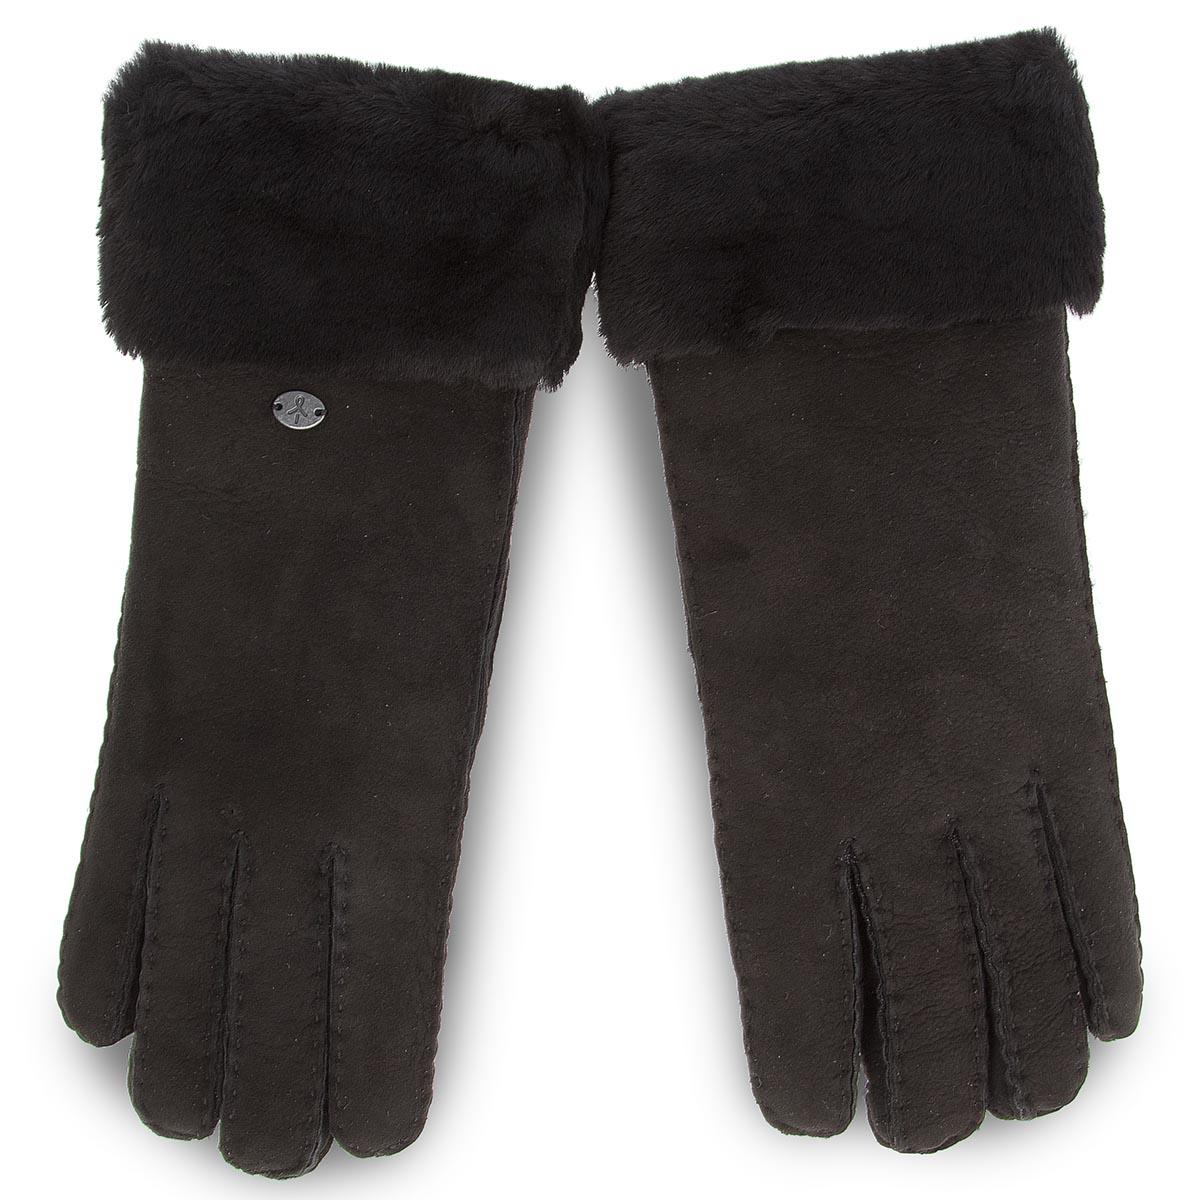 Image of Damenhandschuhe EMU AUSTRALIA - Apollo Bay Gloves M/L Black 1